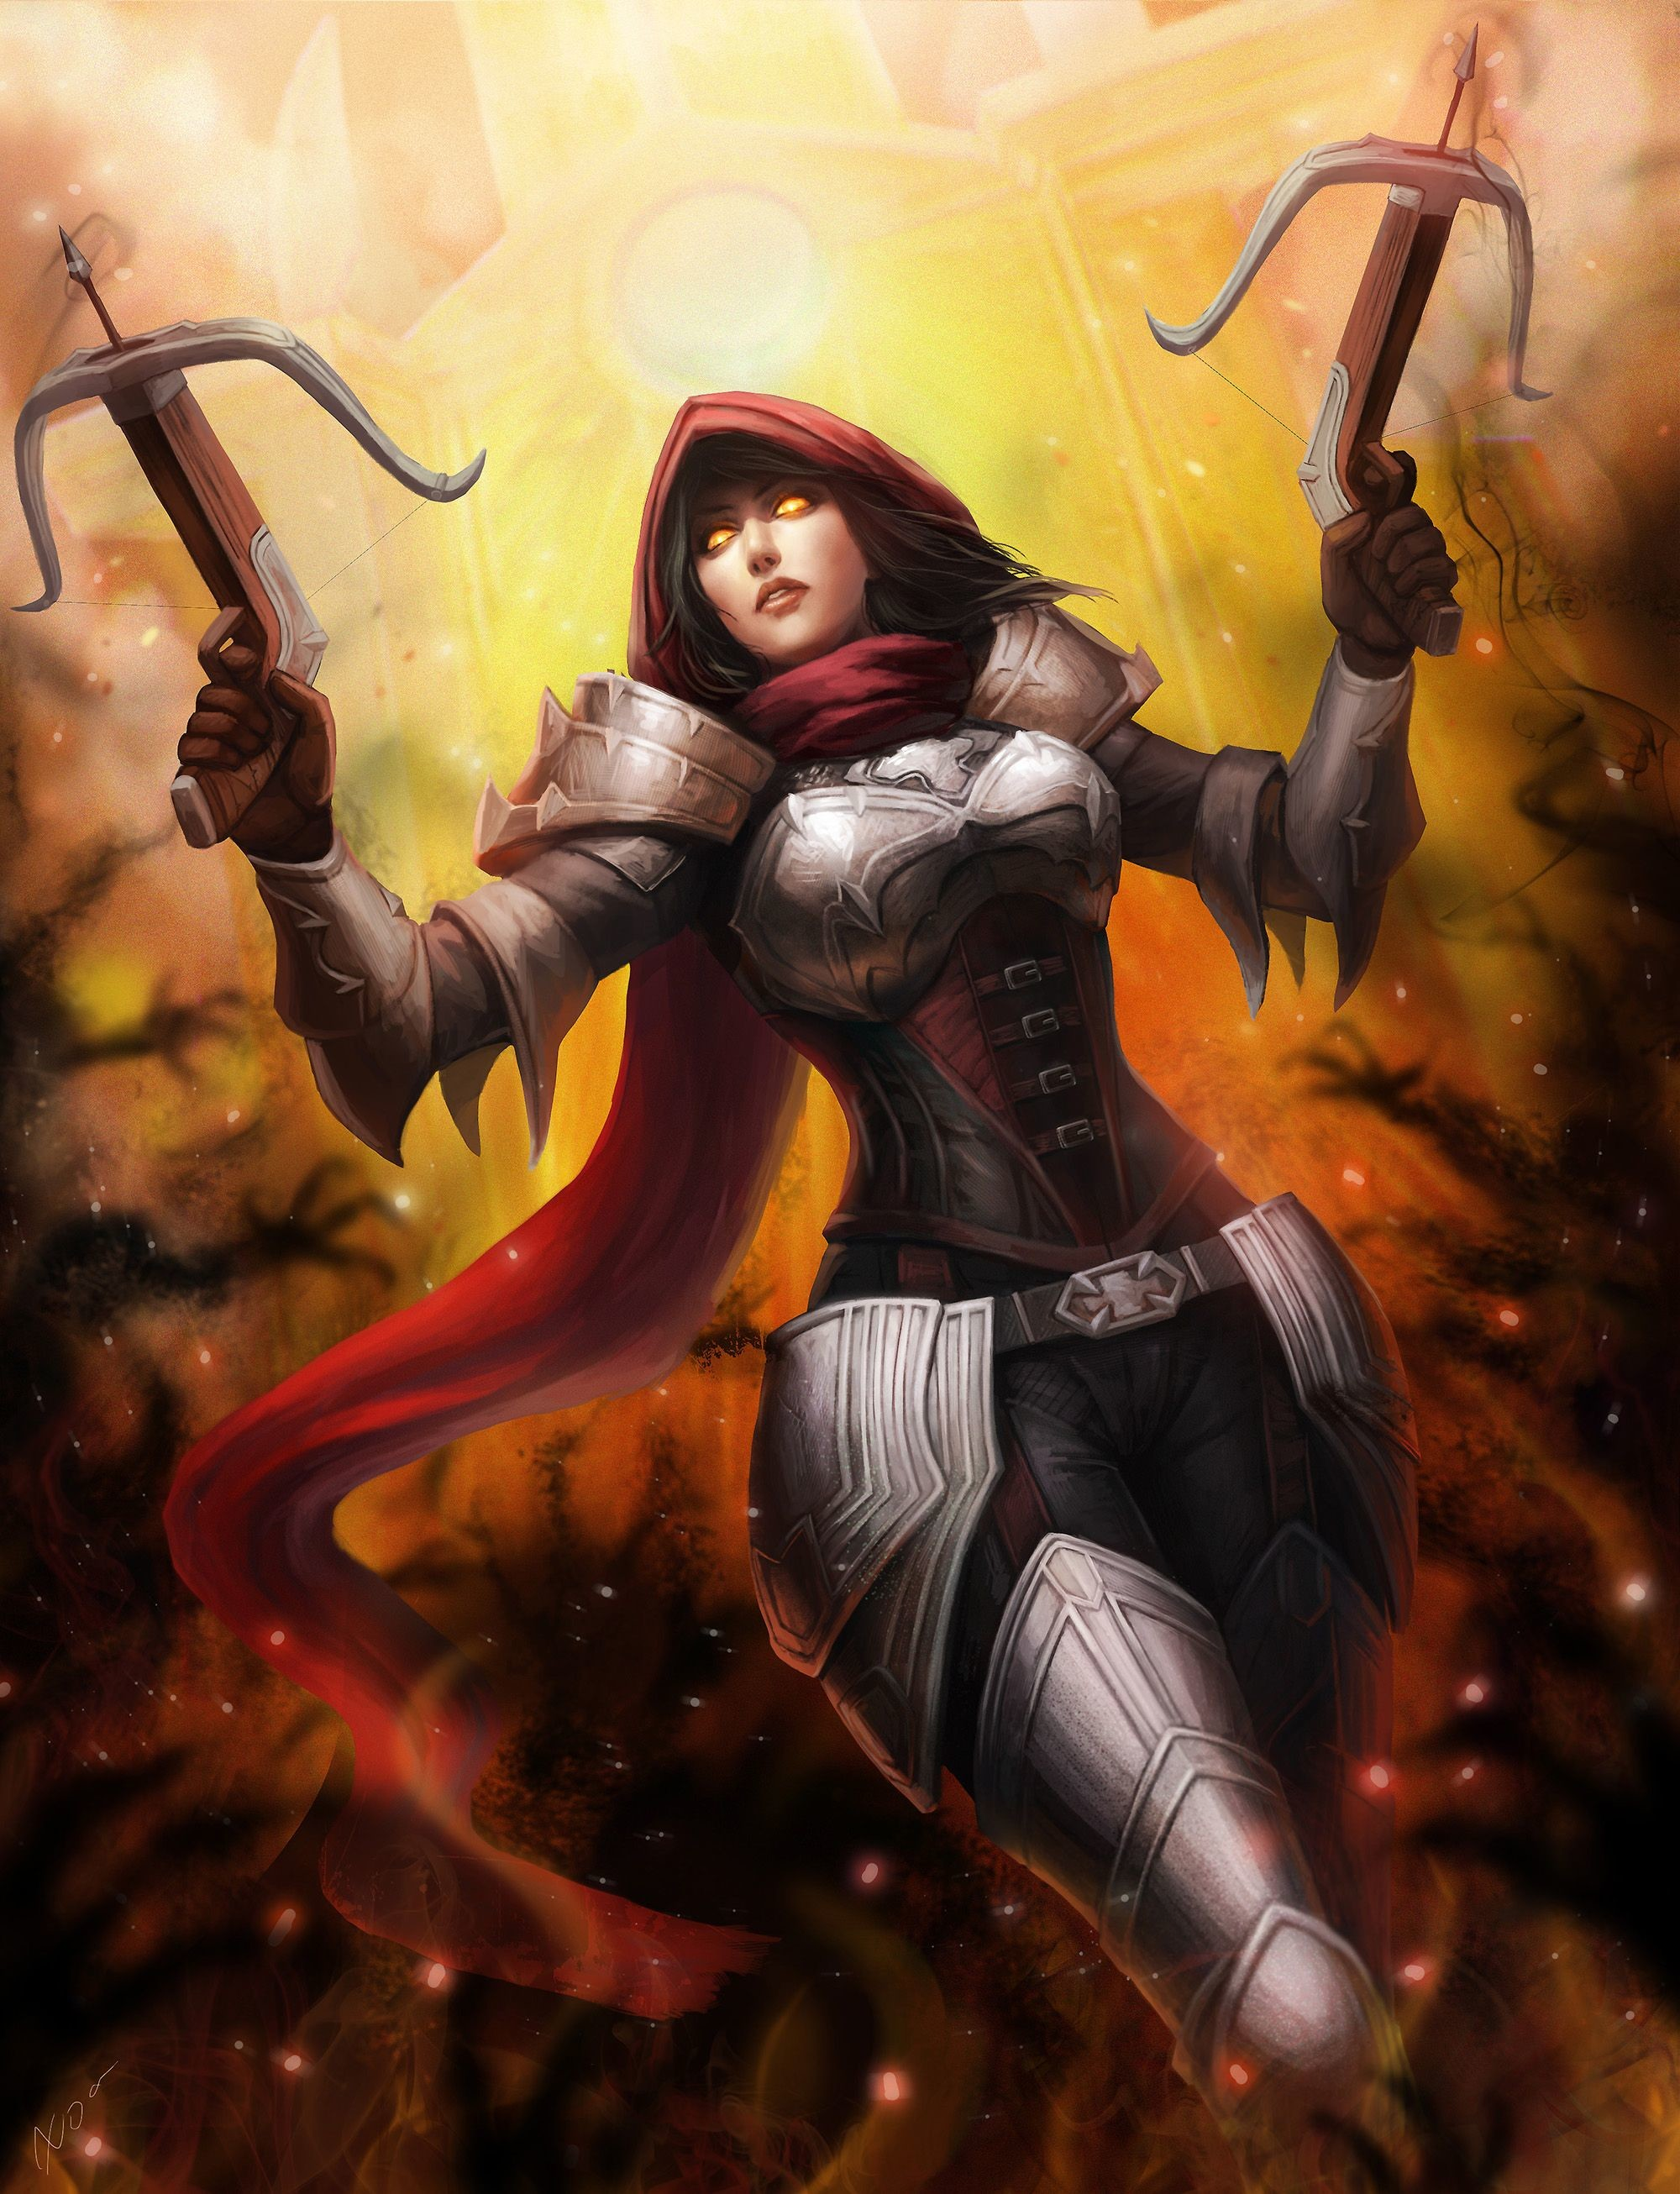 Res: 2000x2612, Diablo 3 :Demon Hunter